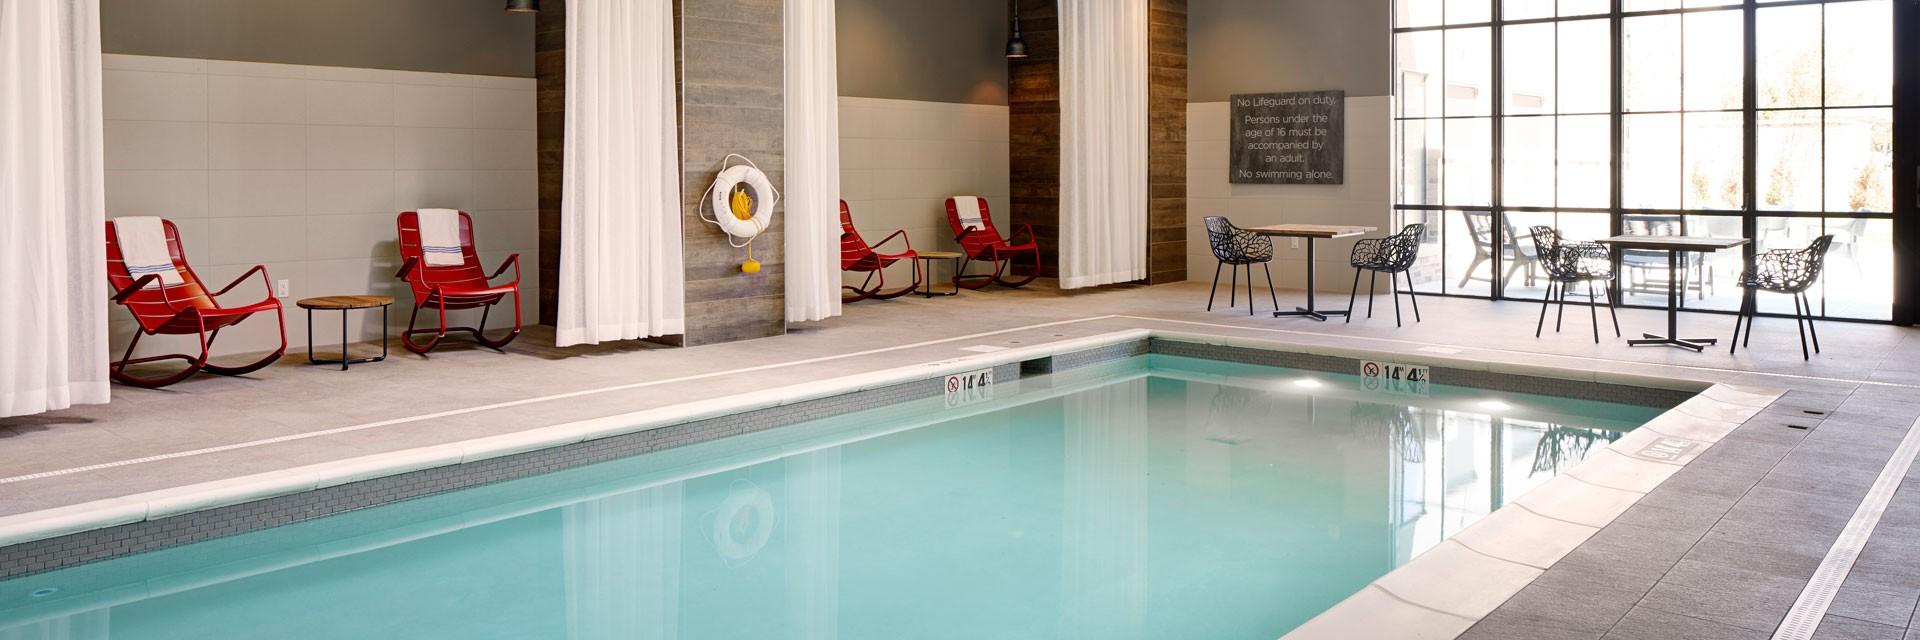 Archer Hotel Florham Park Indoor Pool